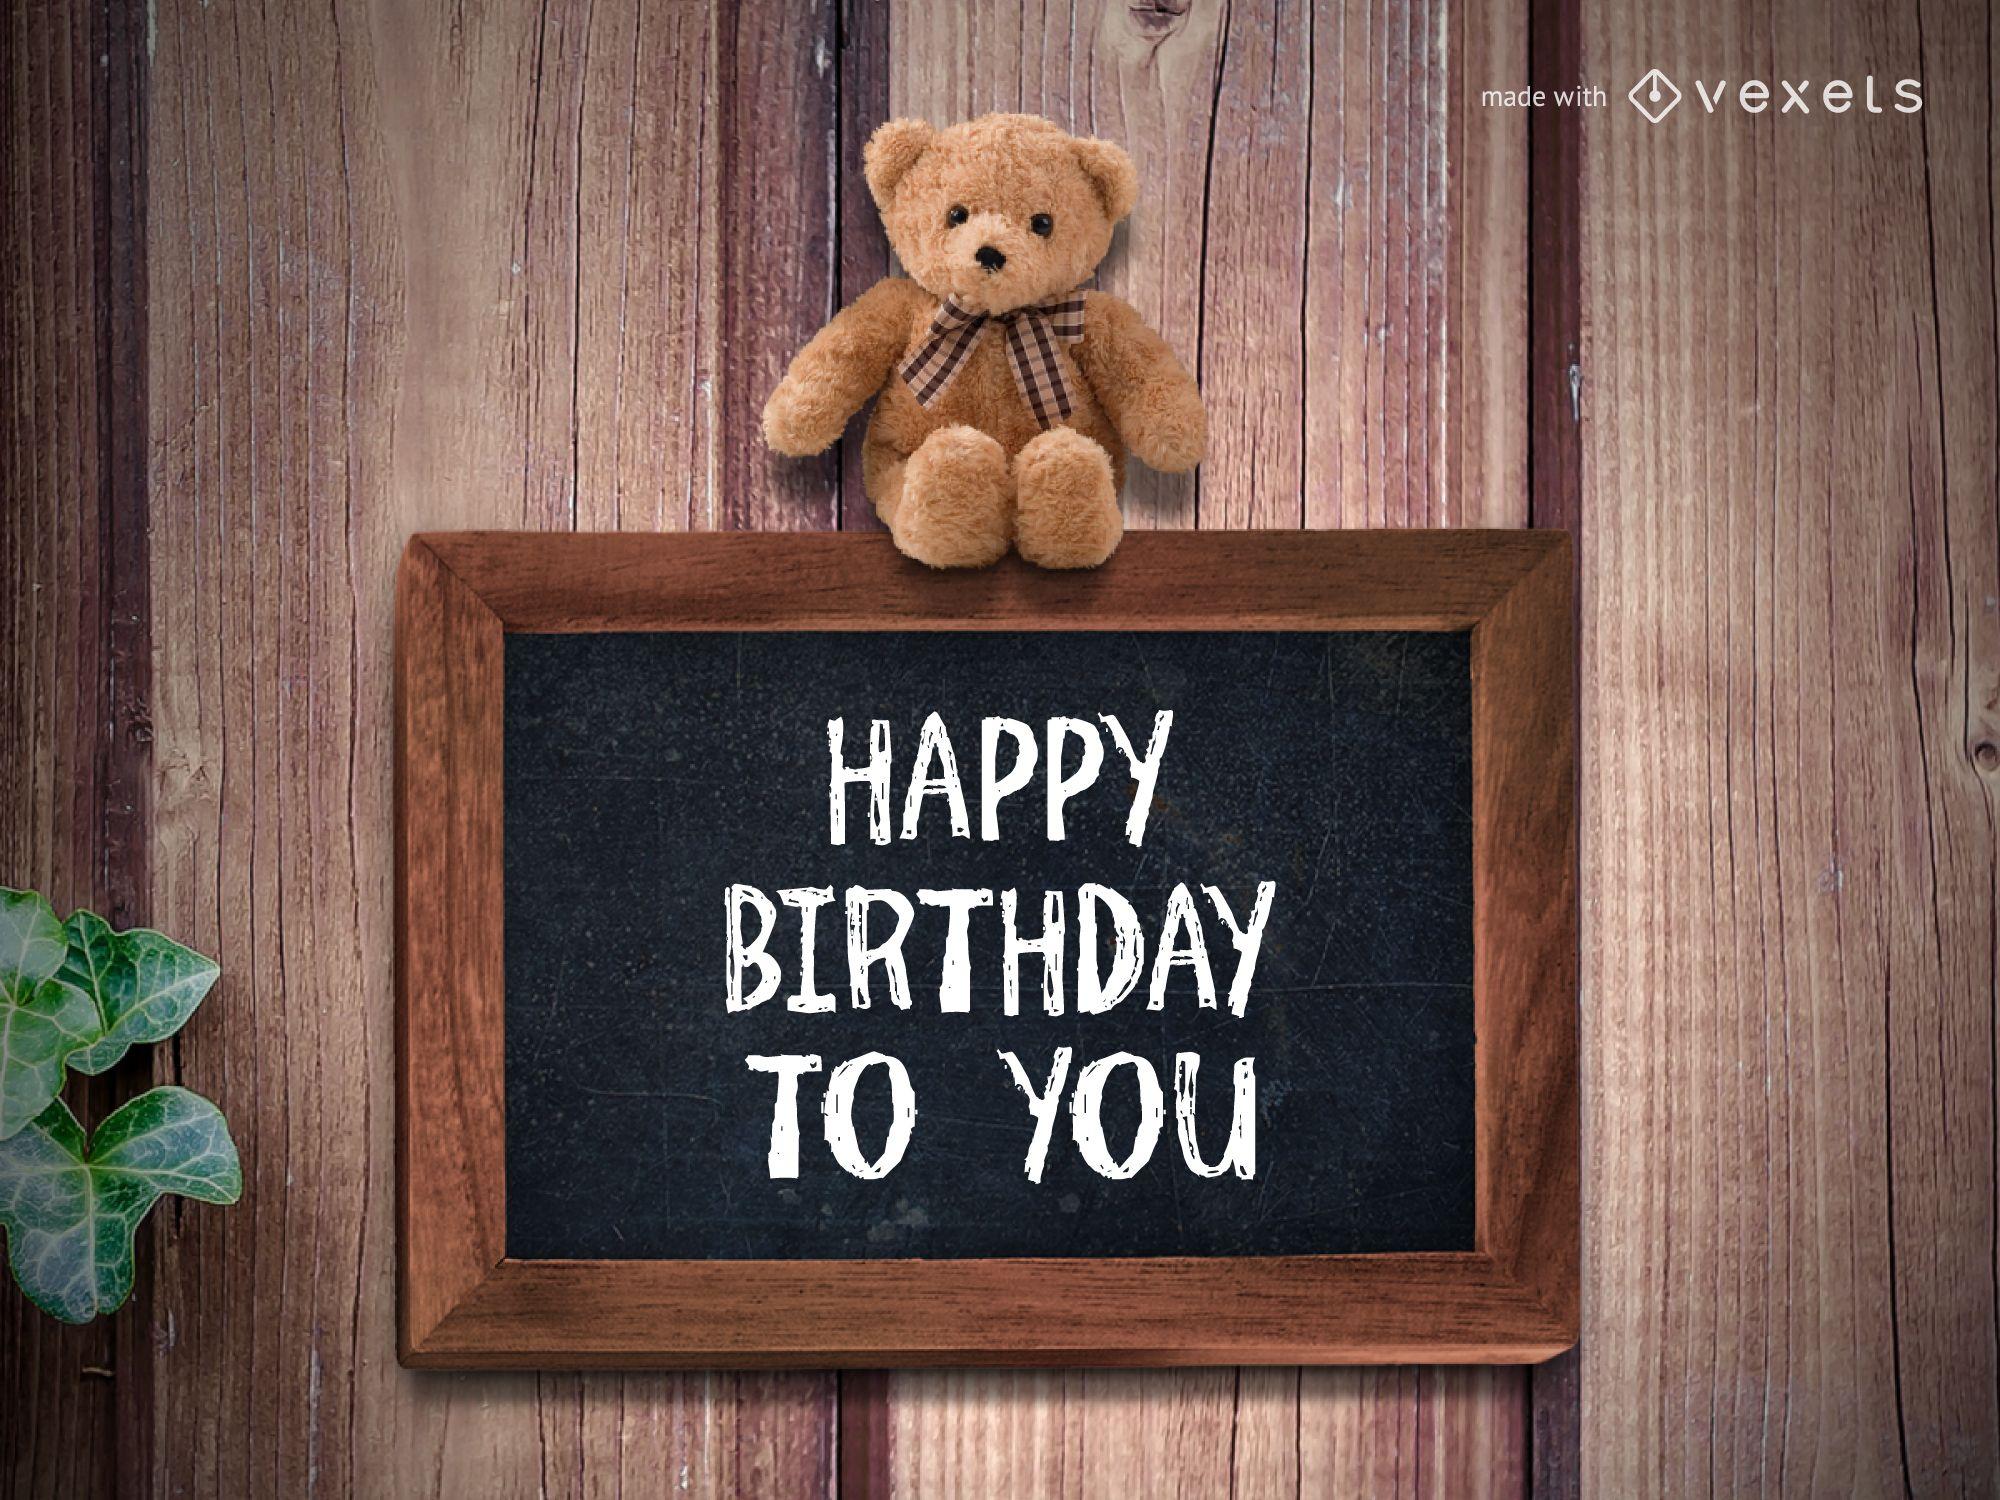 Happy Birthday greeting maker